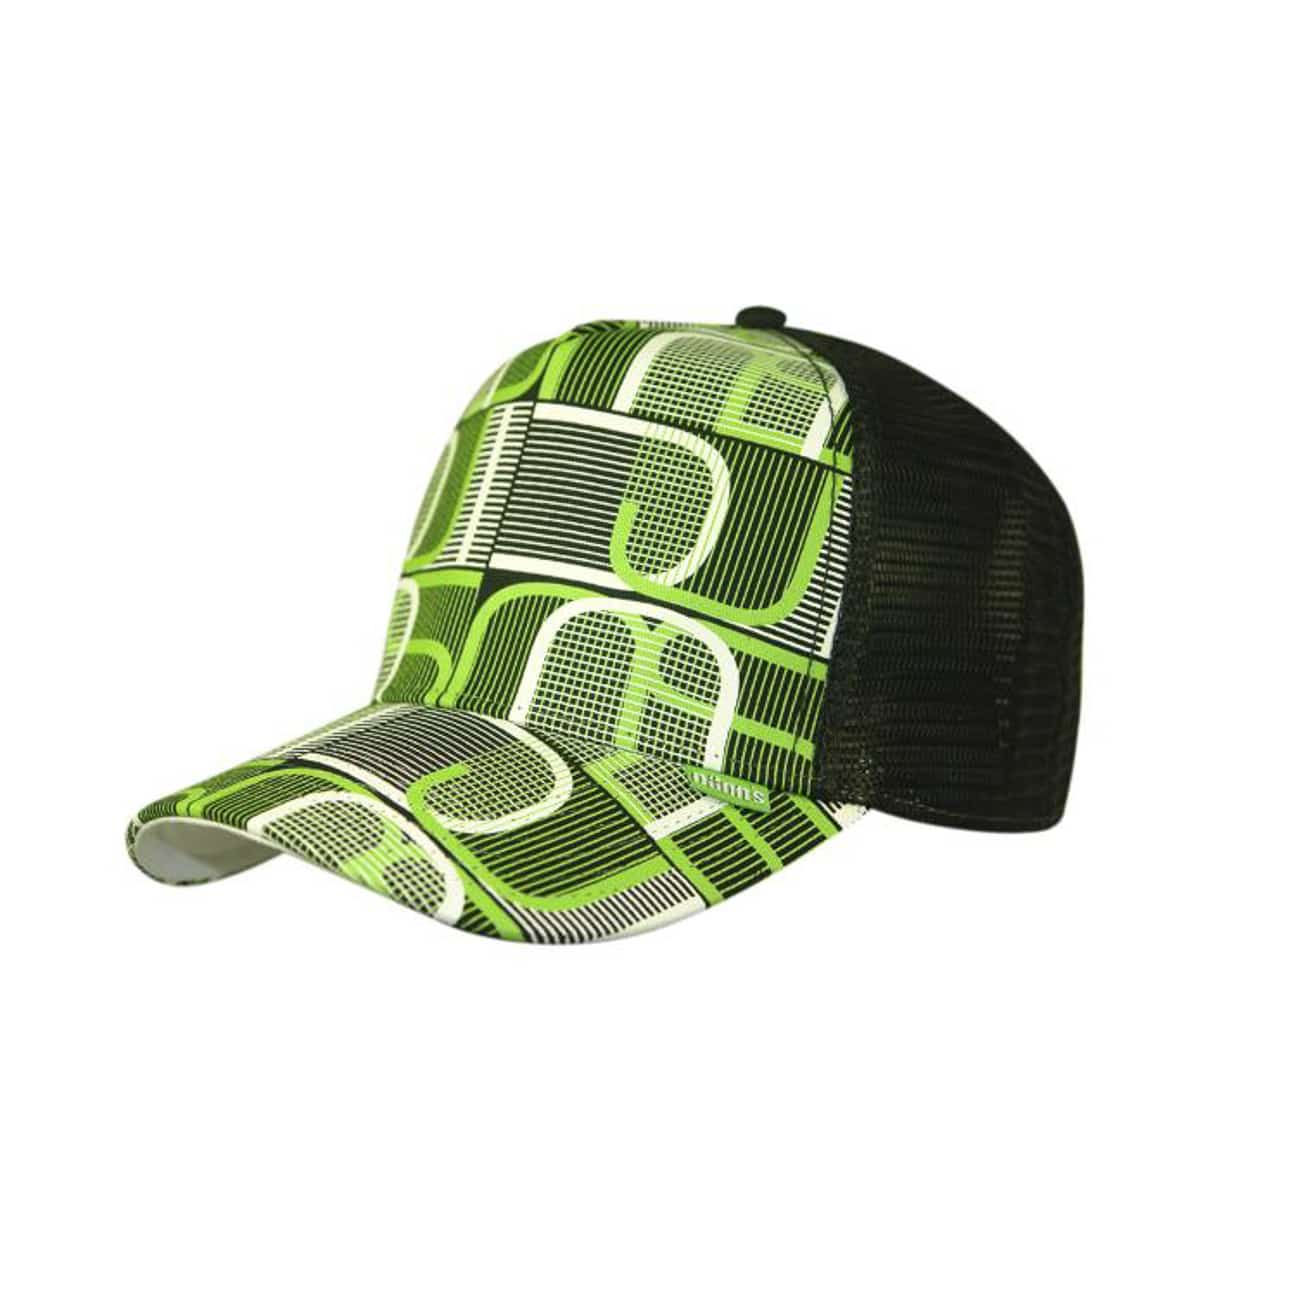 shades trucker cap by djinns eur 19 99 hats caps. Black Bedroom Furniture Sets. Home Design Ideas